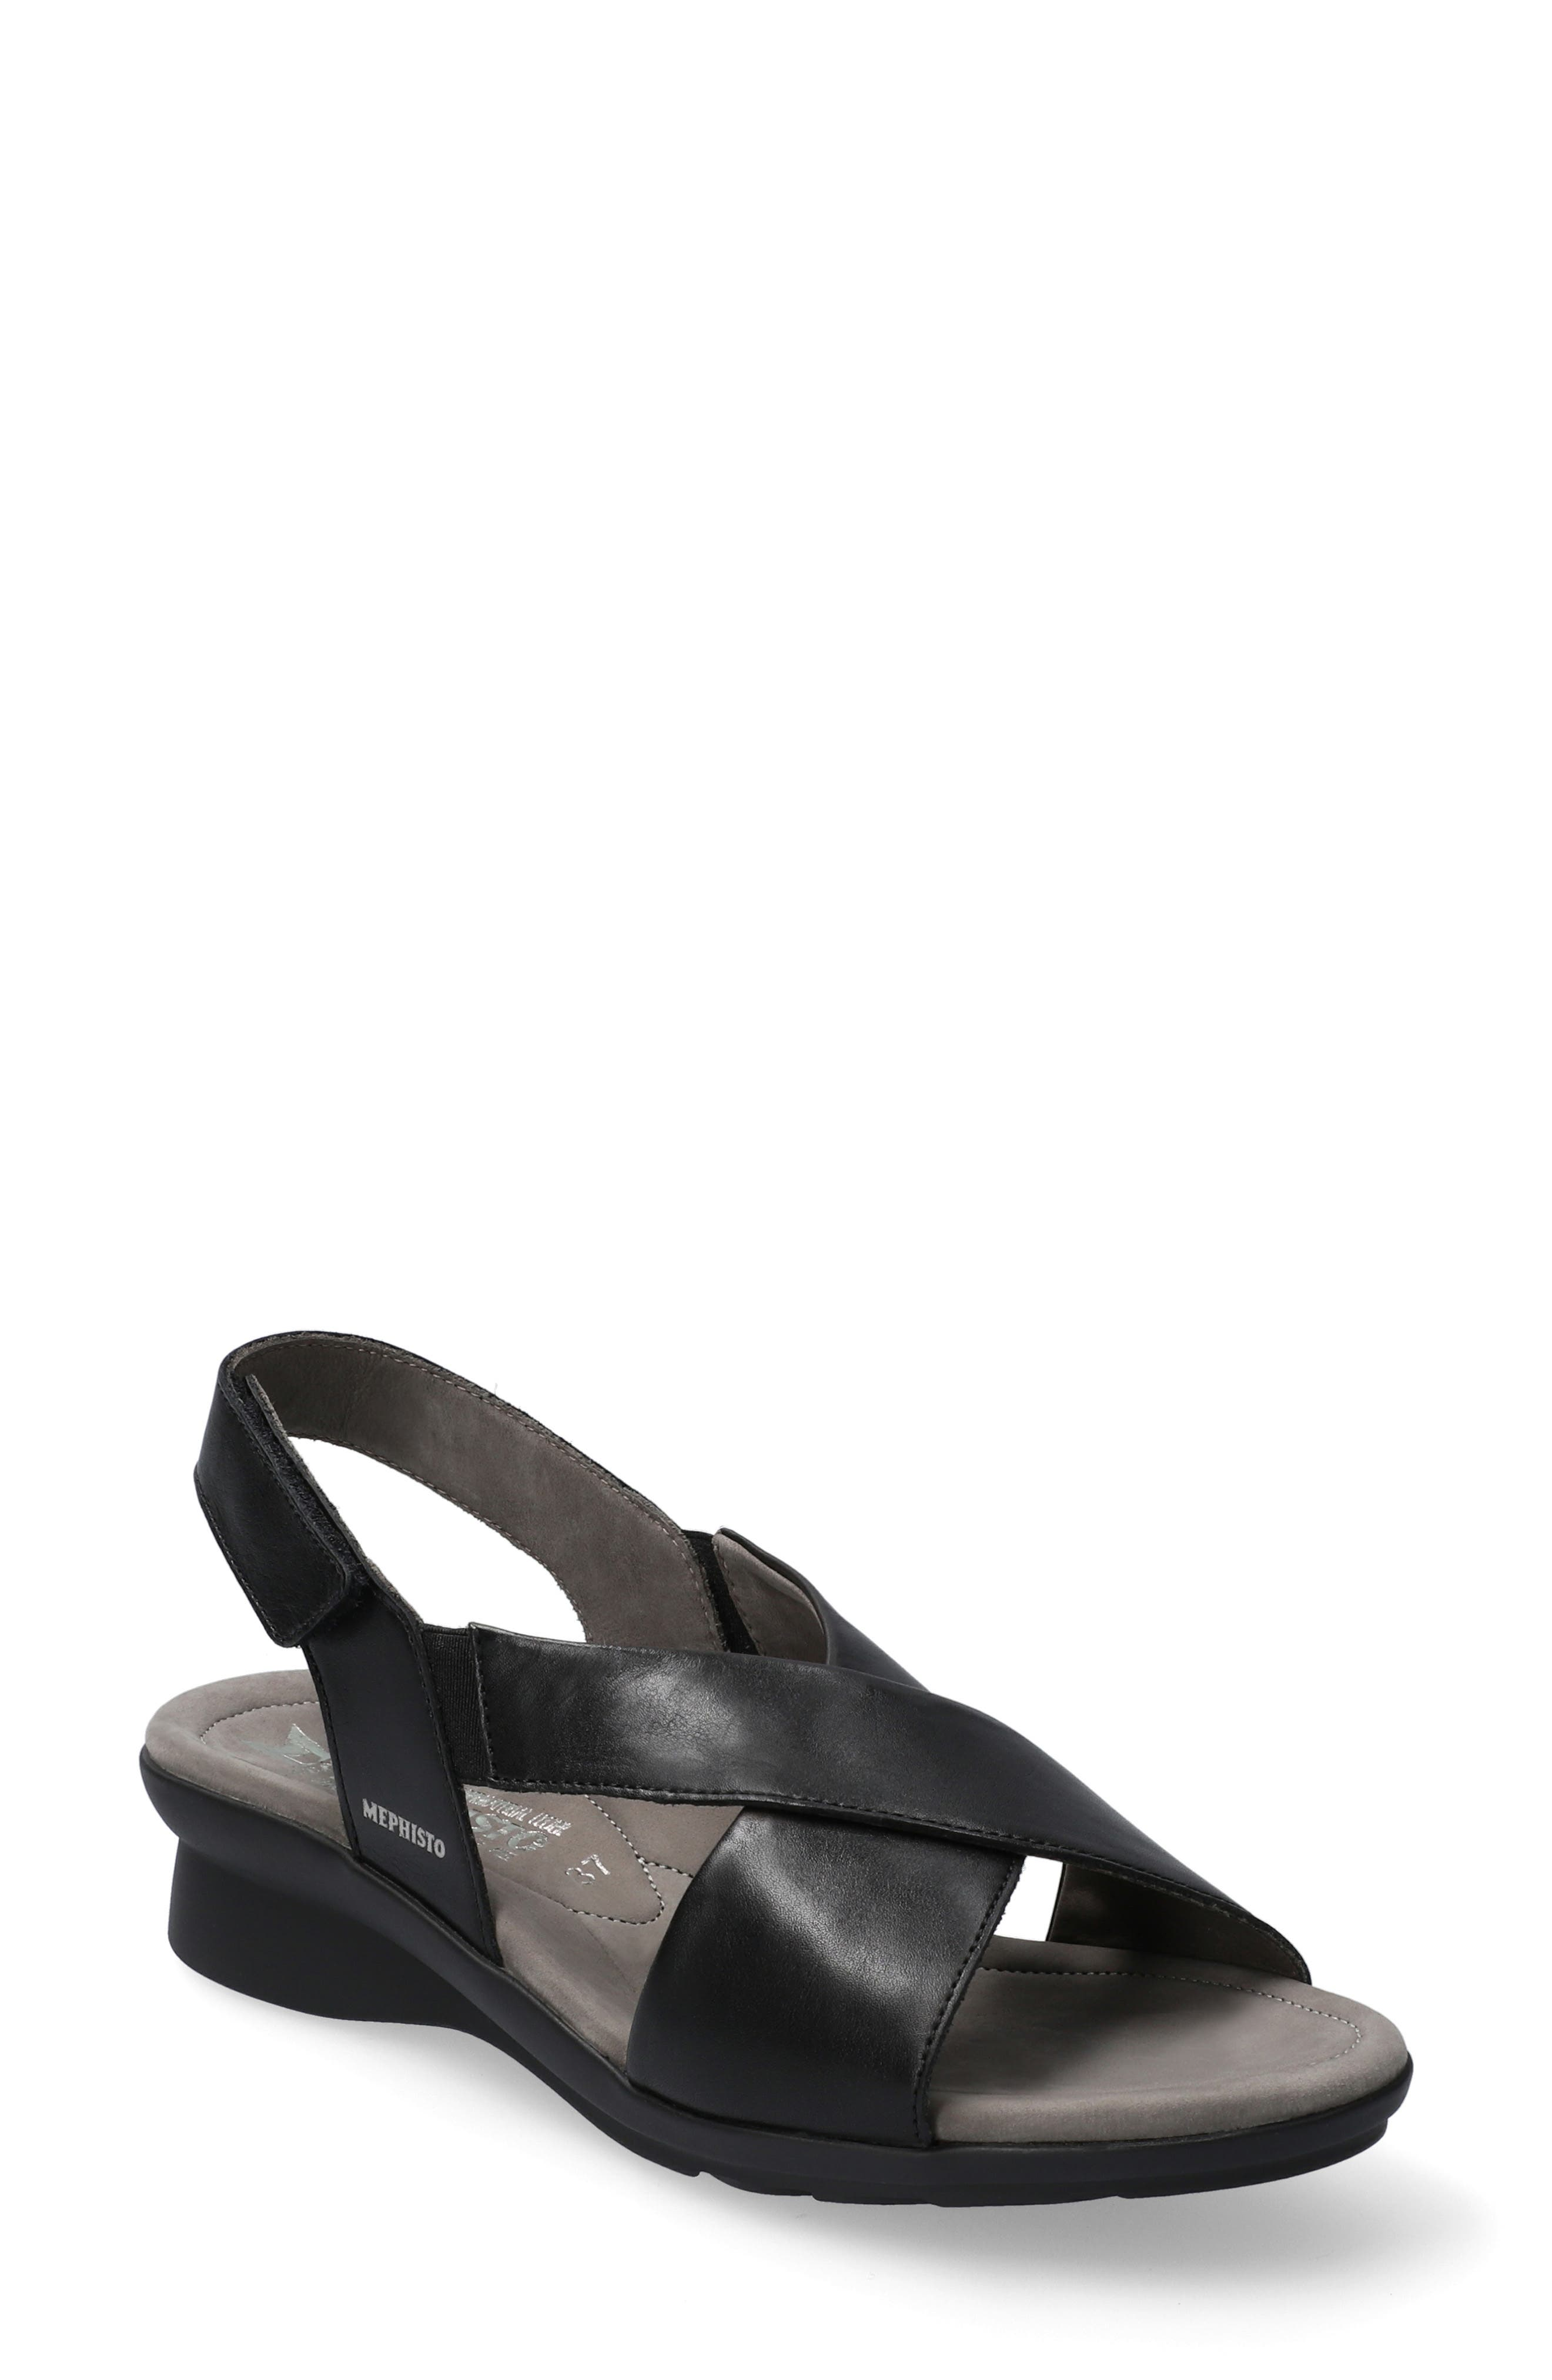 Women's Mephisto Shoes   Nordstrom